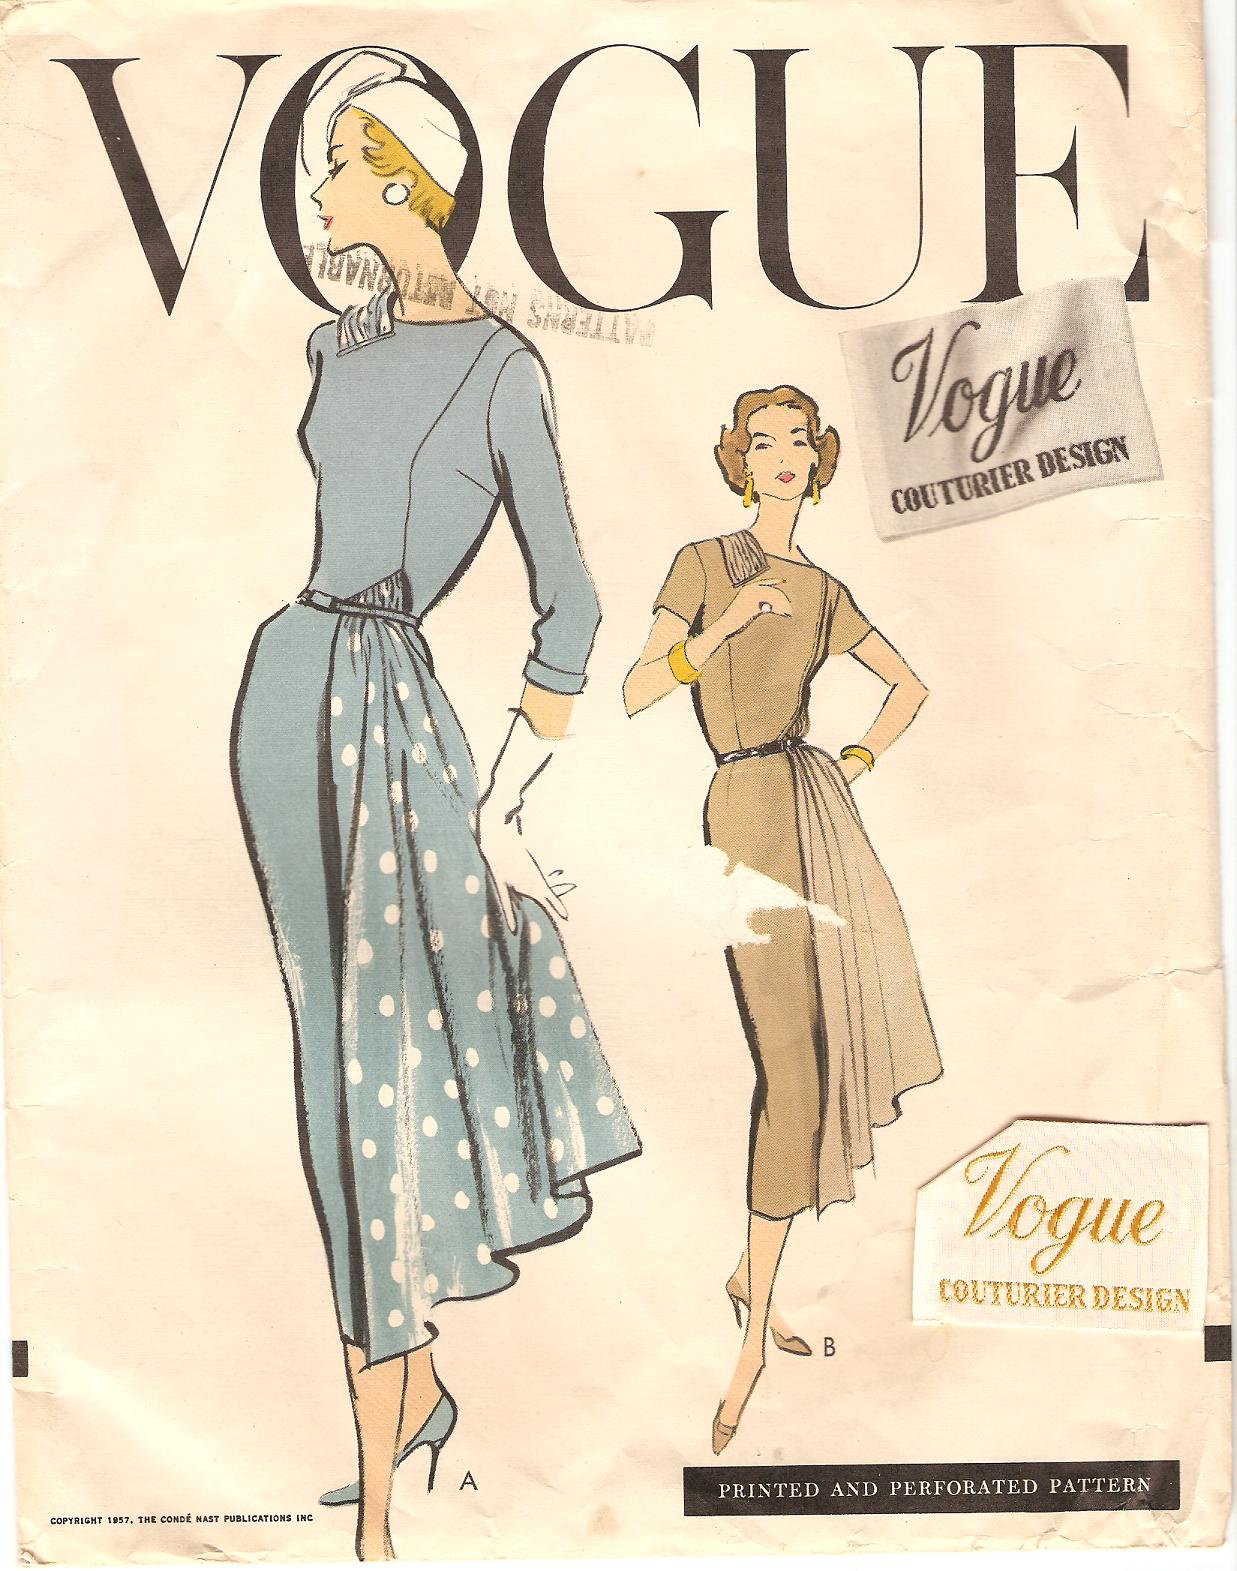 Vogue 959 - Vintage Sewing Patterns